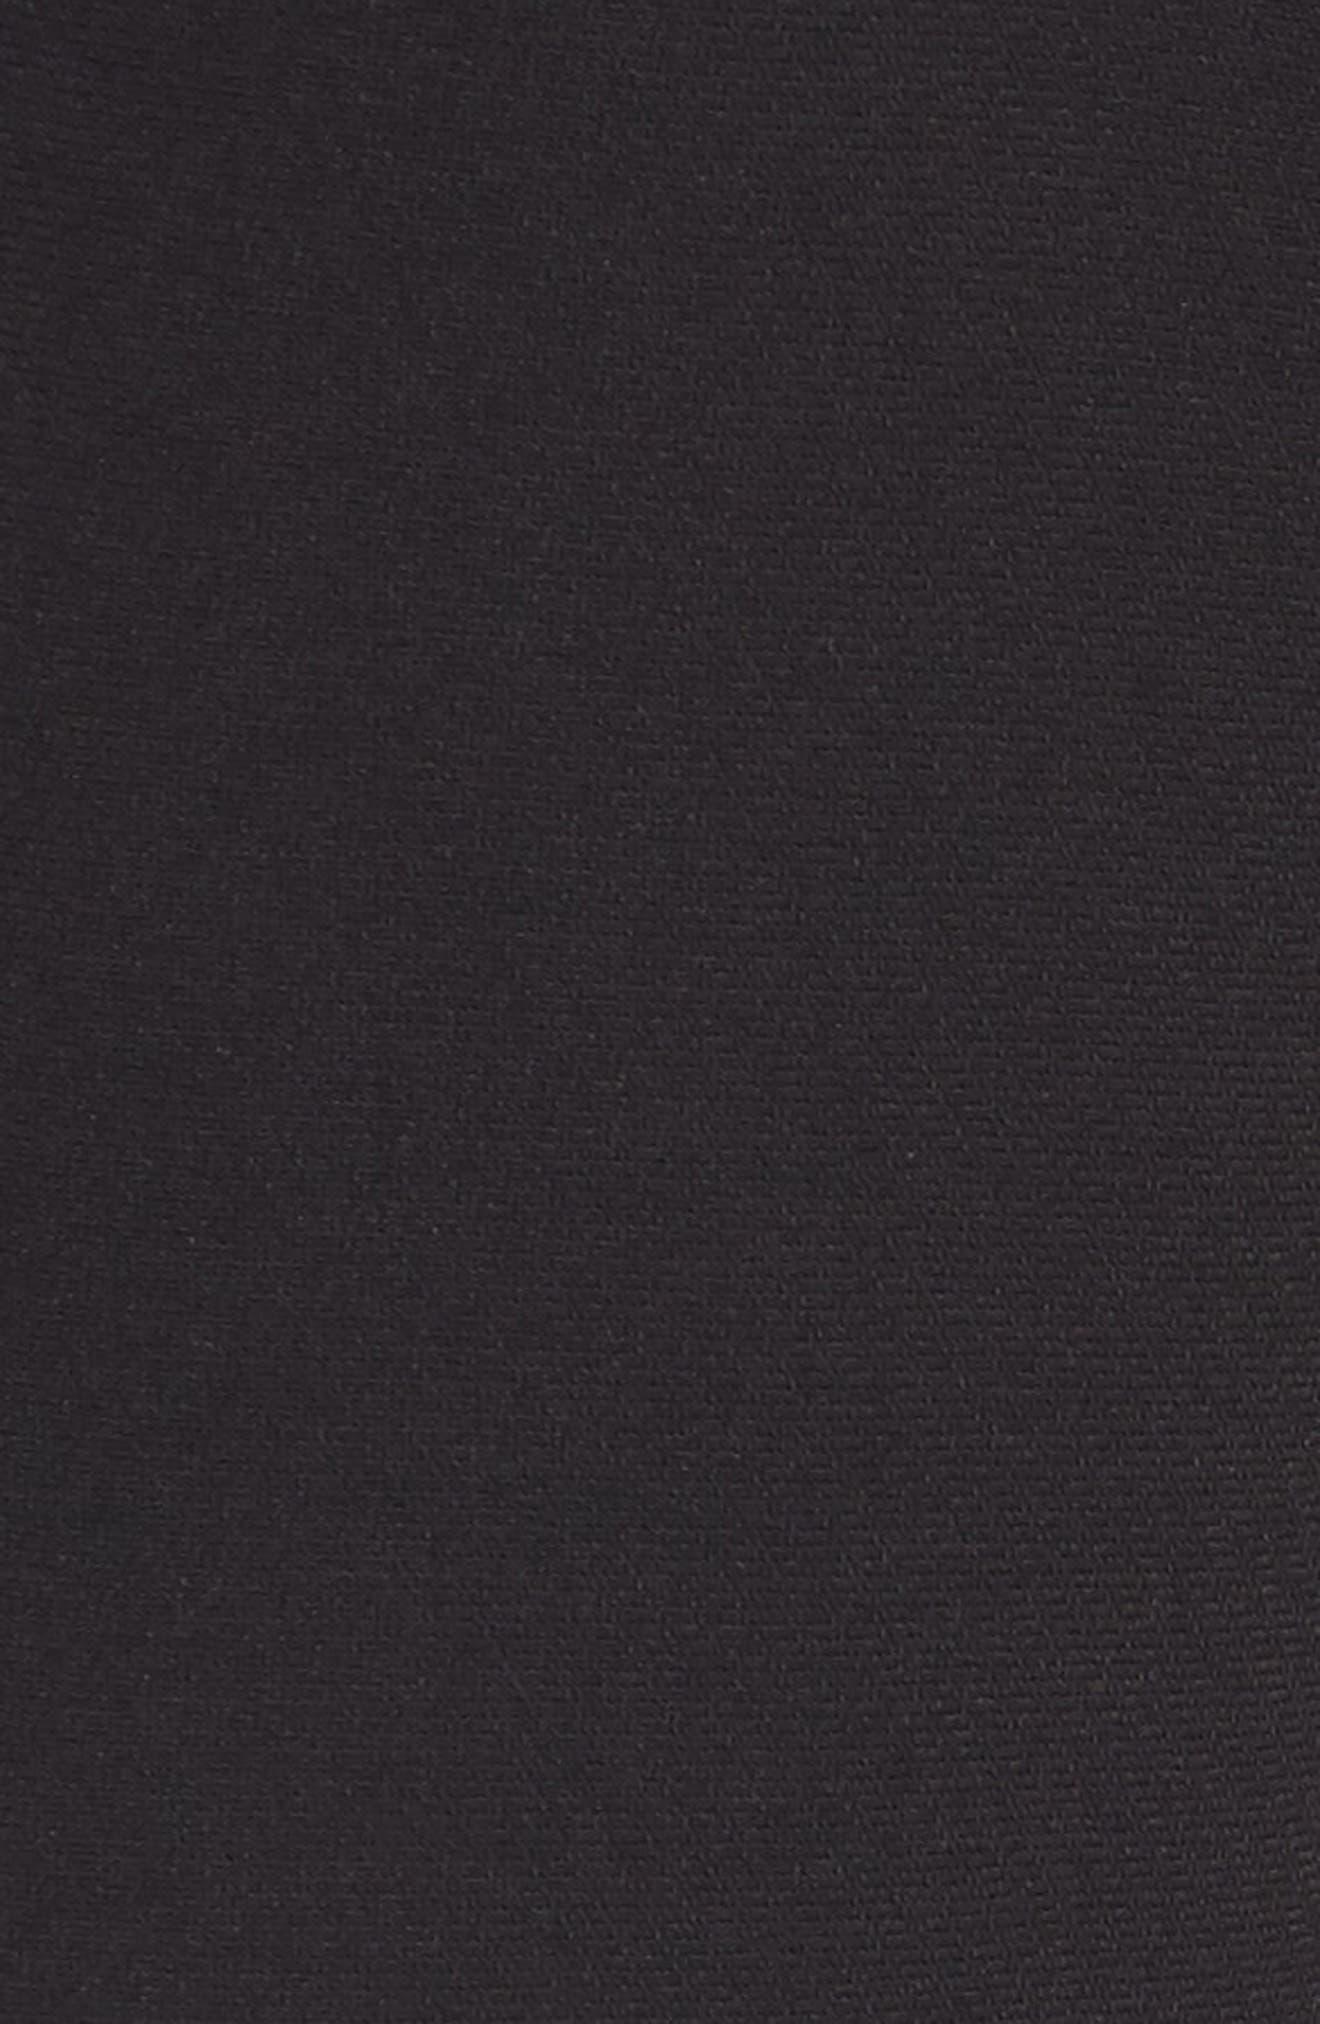 Ruffle Crop Flare Pants,                             Alternate thumbnail 5, color,                             Black